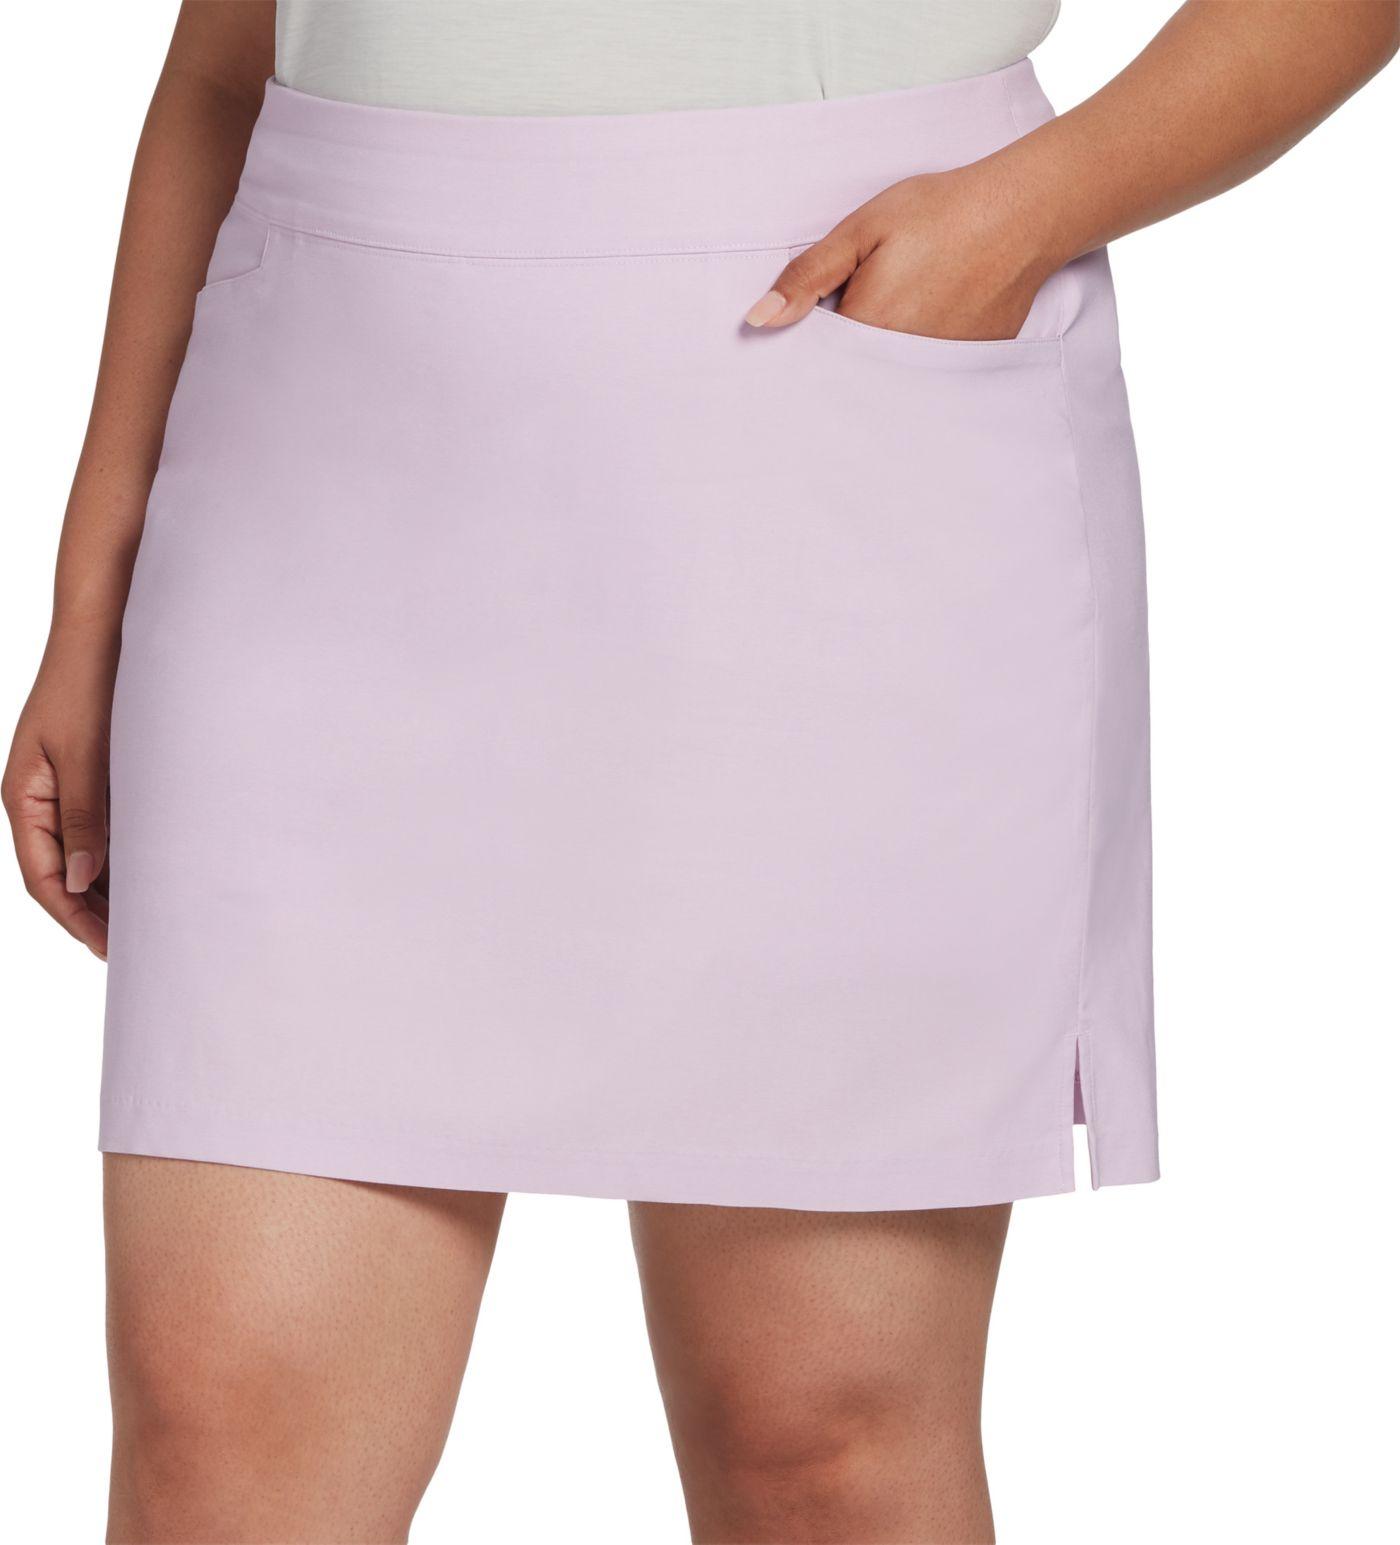 Lady Hagen Women's Tummy Control Golf Skort - Extended Sizes